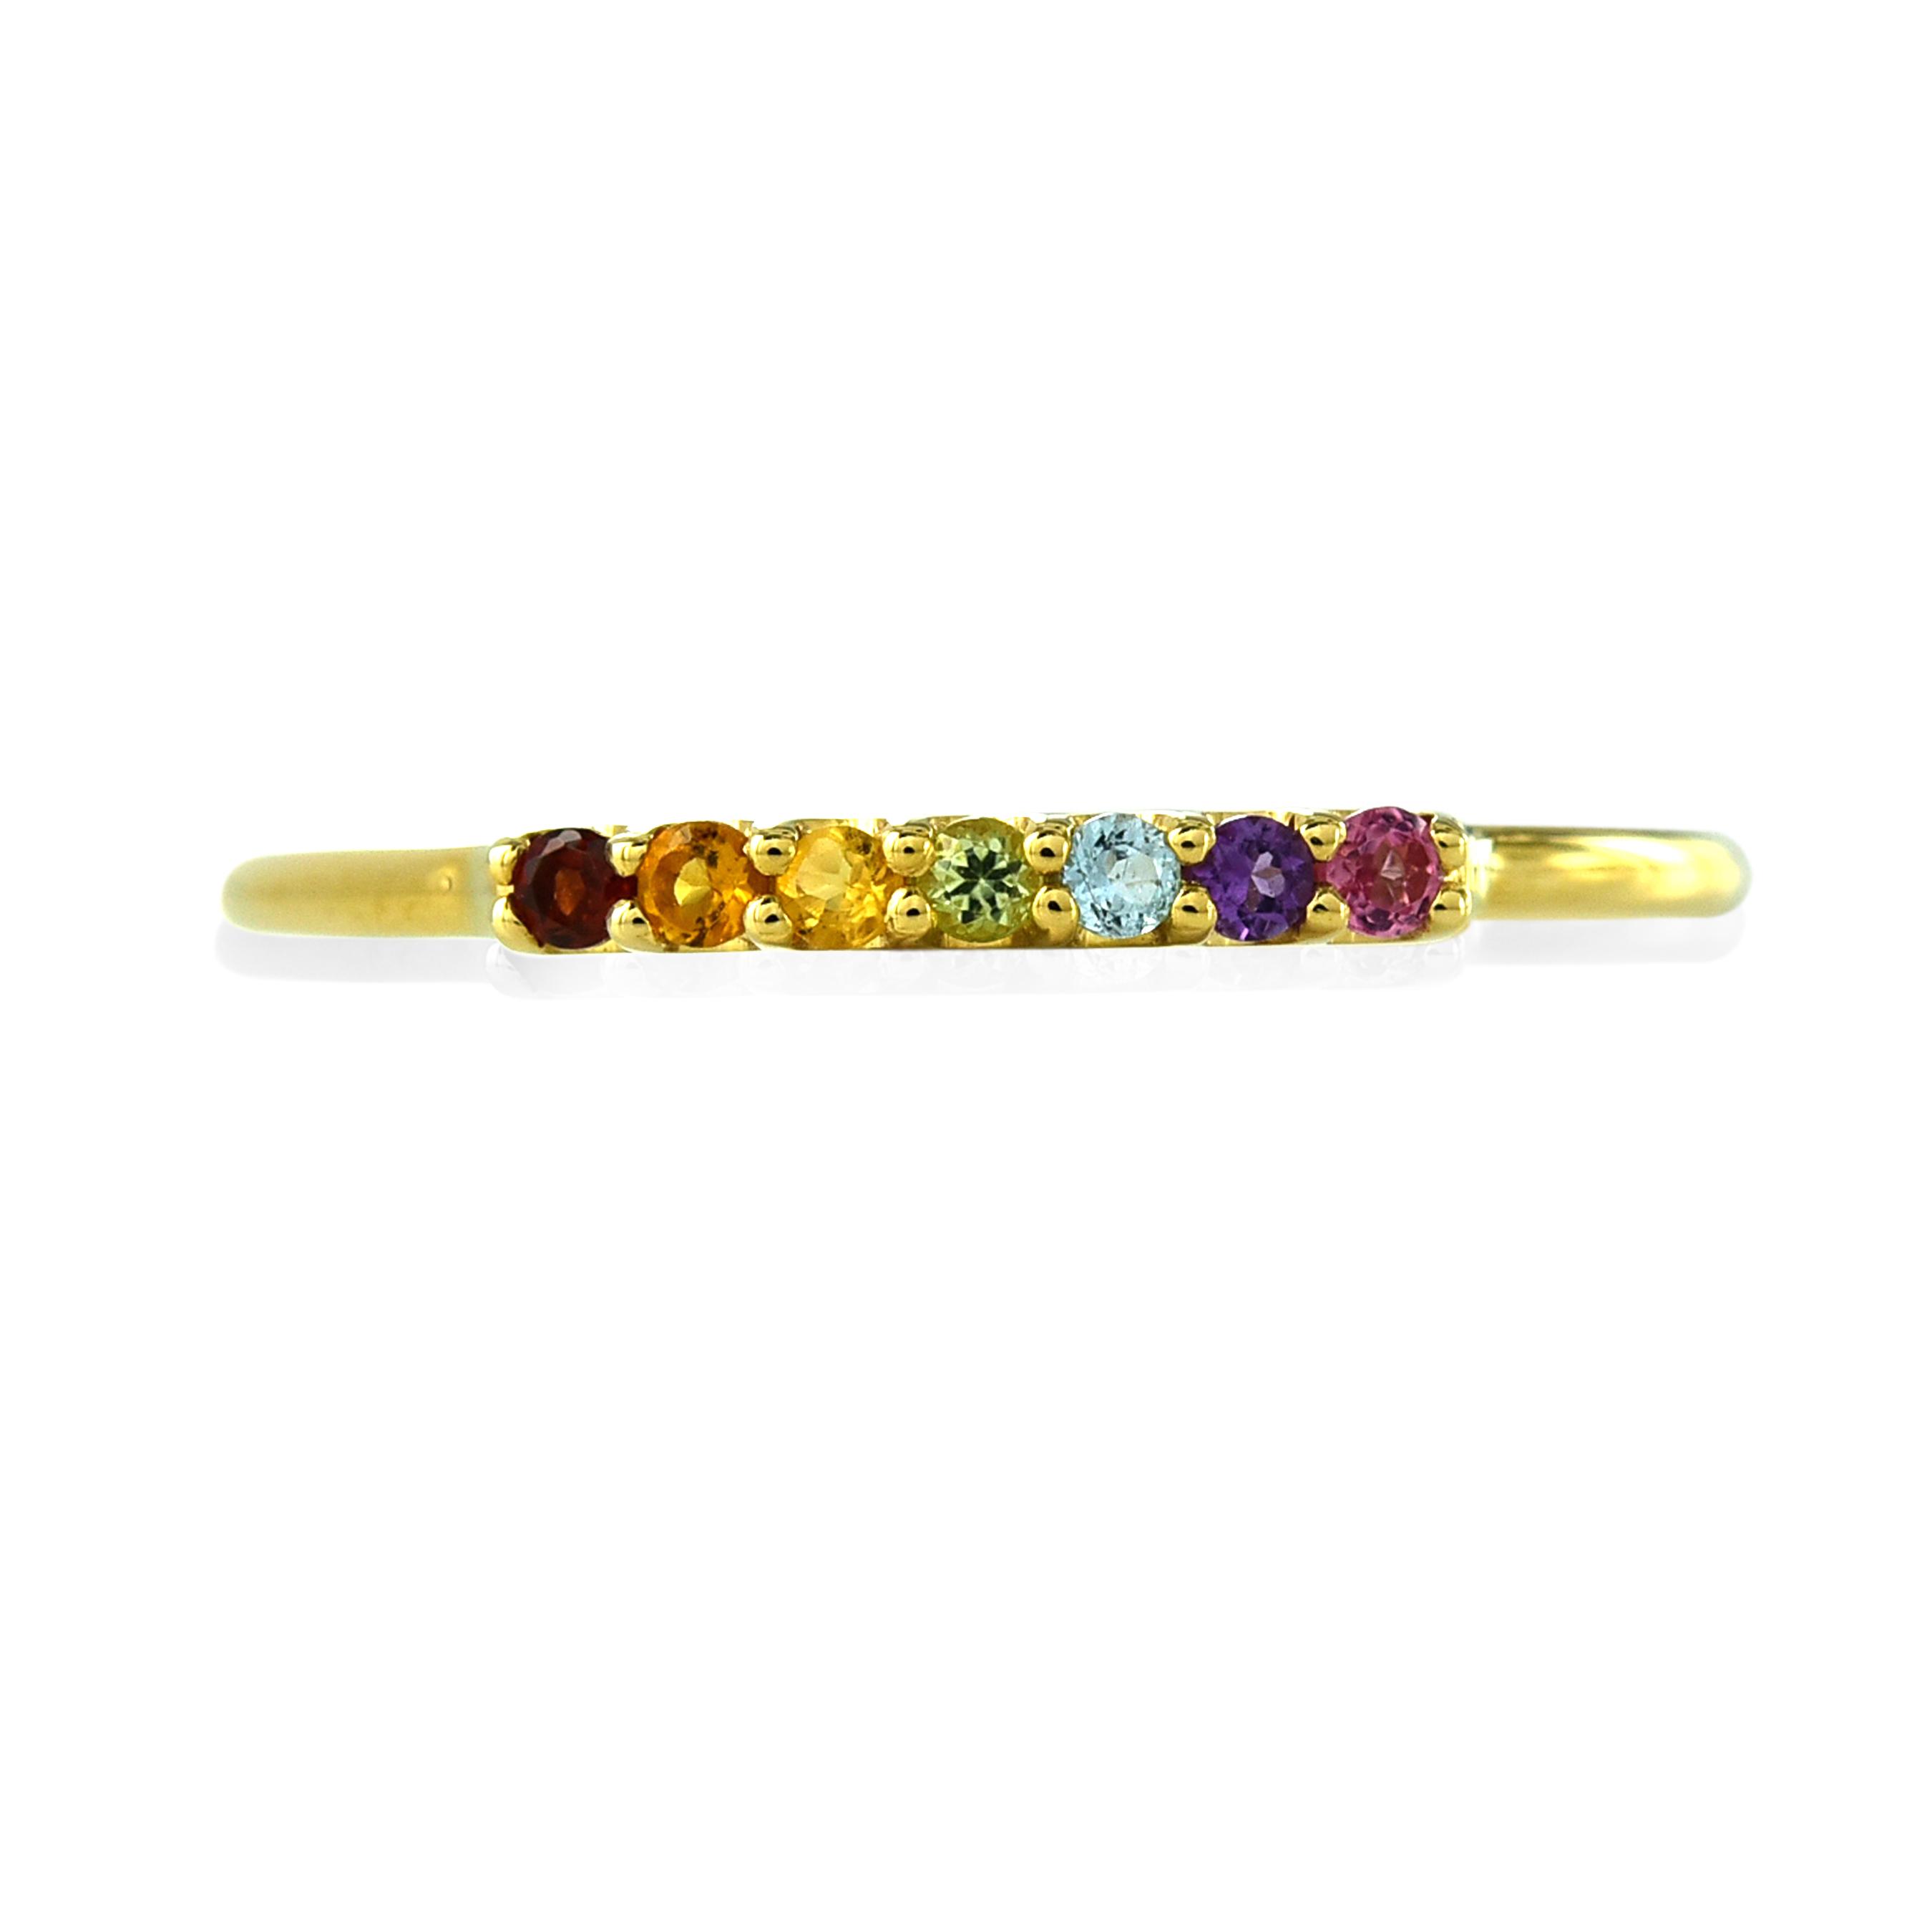 Golden Rutile pendant 925 Oxidized Sterling silver charm fits all bracelets Tears Drop Glermes design collection